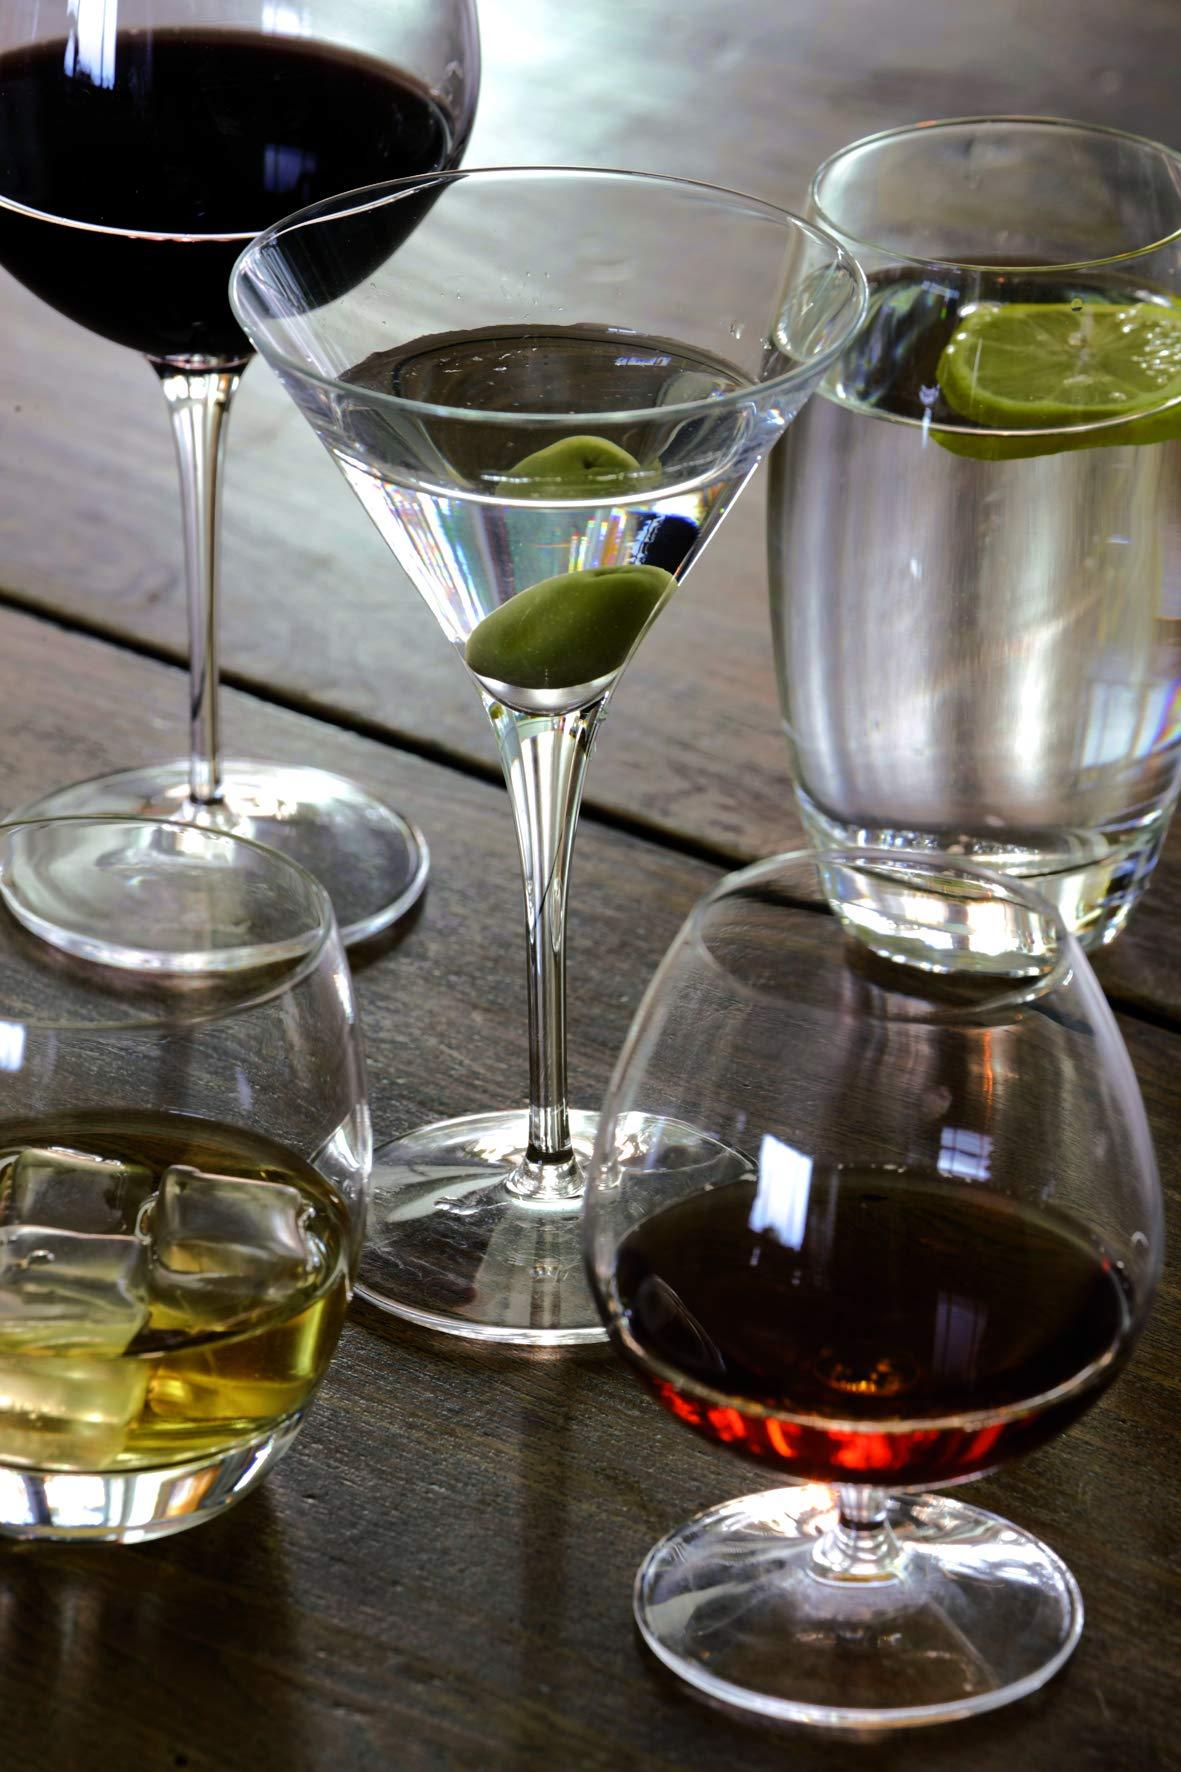 Luigi Bormioli 10564/01 Vinoteque 15.75 oz Cognac/Brandy Glasses, Set of 6, Clear by Luigi Bormioli